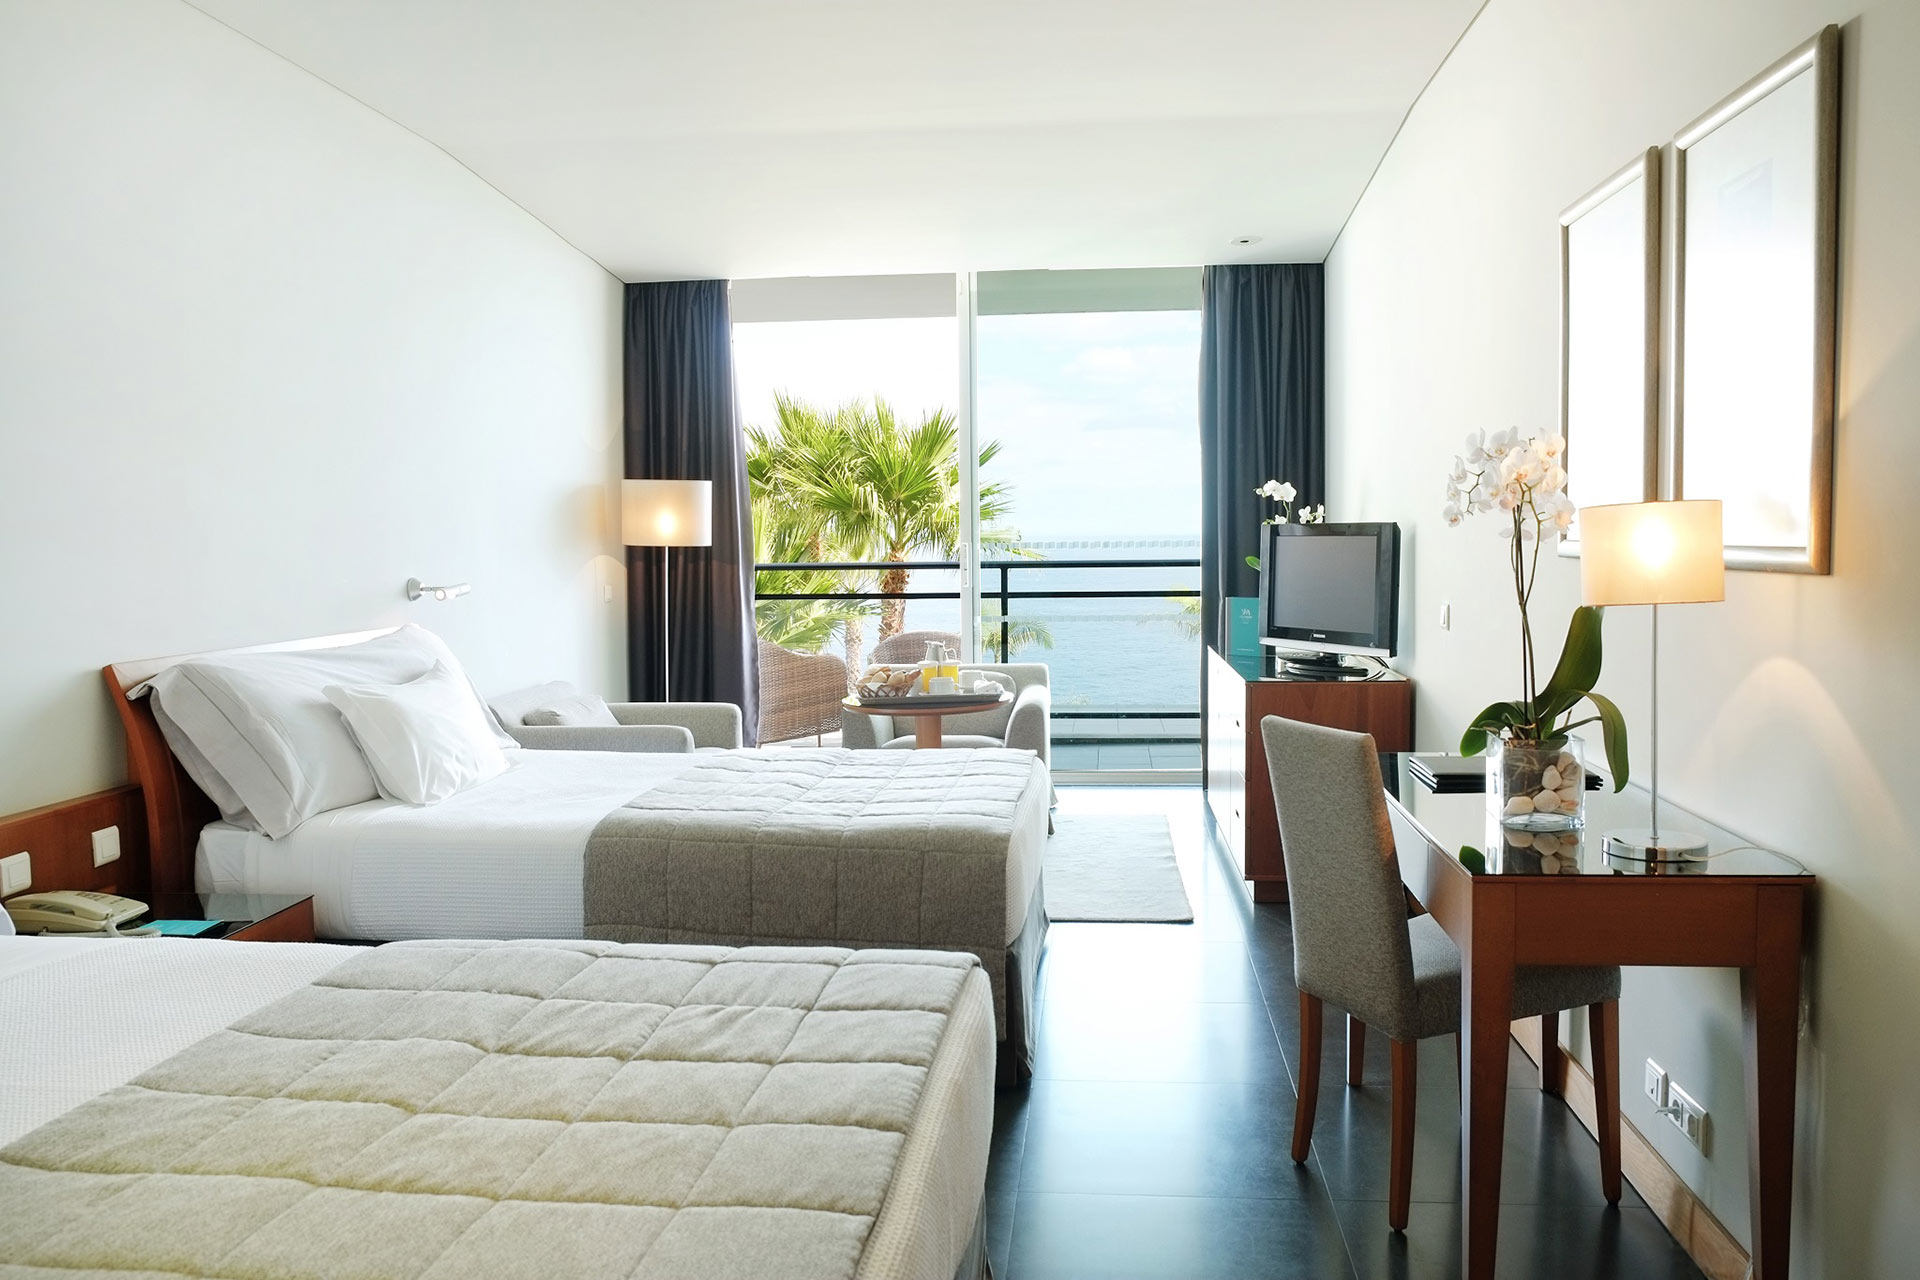 hotel-vidamar-madeira-1 3604